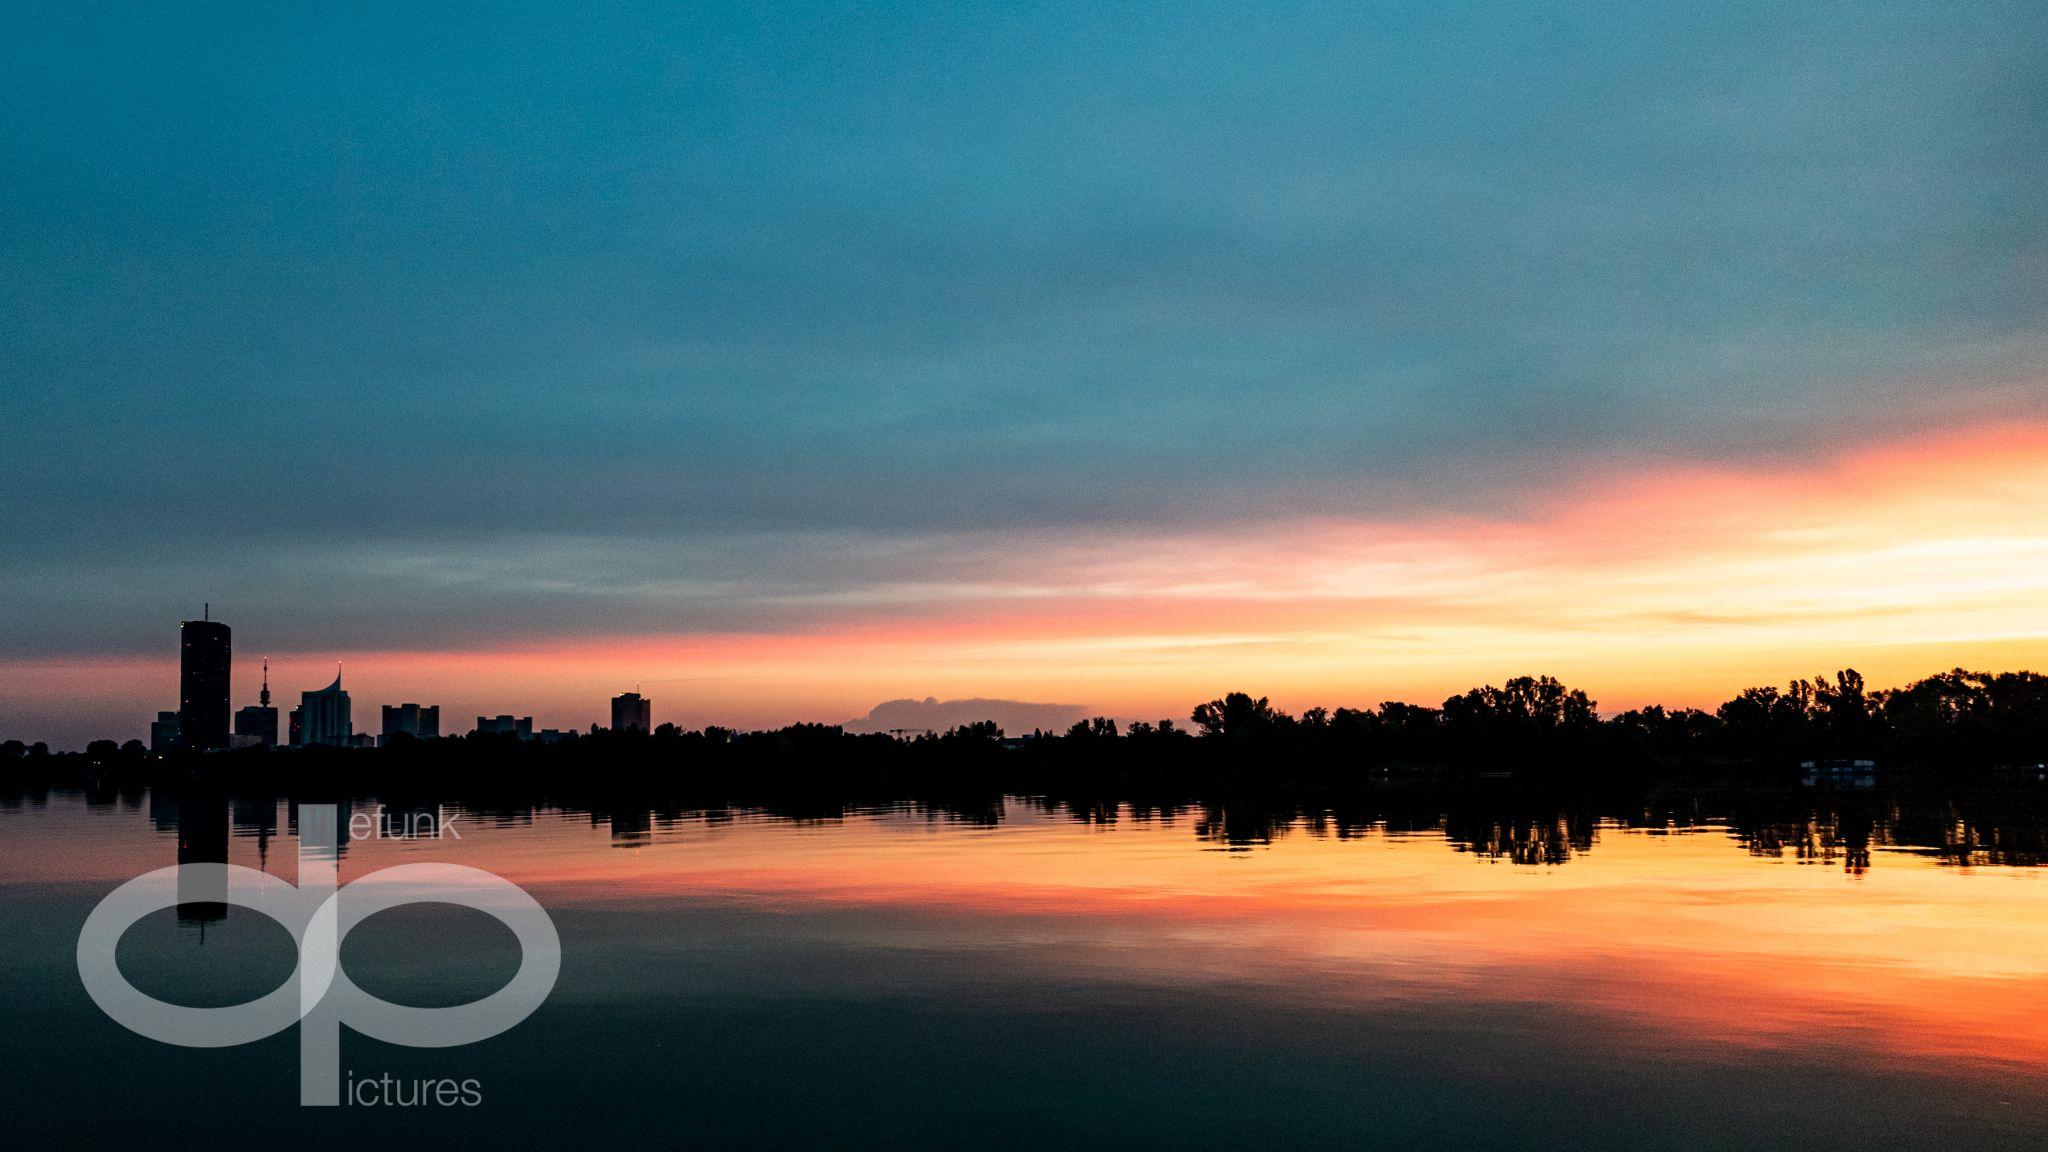 Sunrise from Hilton Vienna Danube Waterfront, Austria